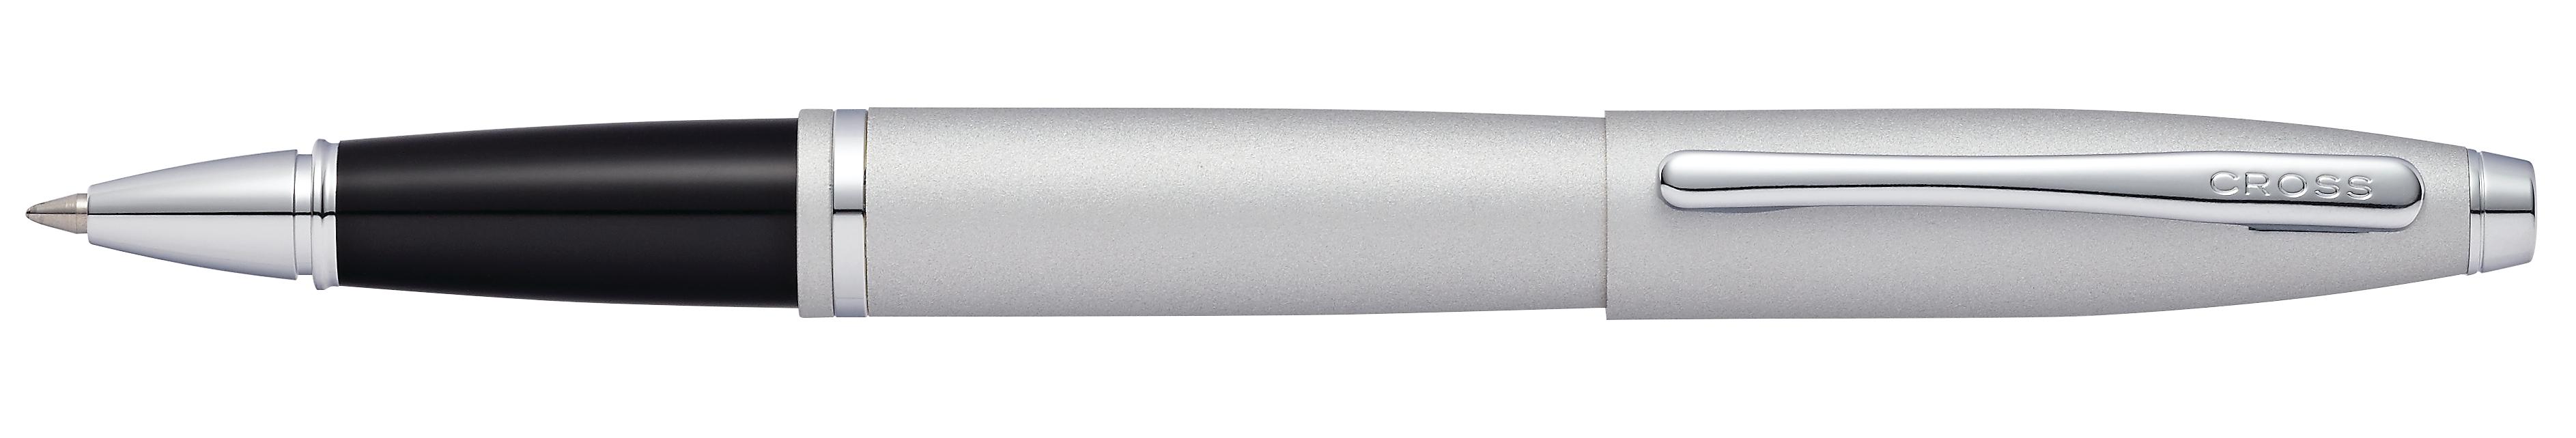 Cross Calais Satin Chrome Rollerball Pen - self-server packaging